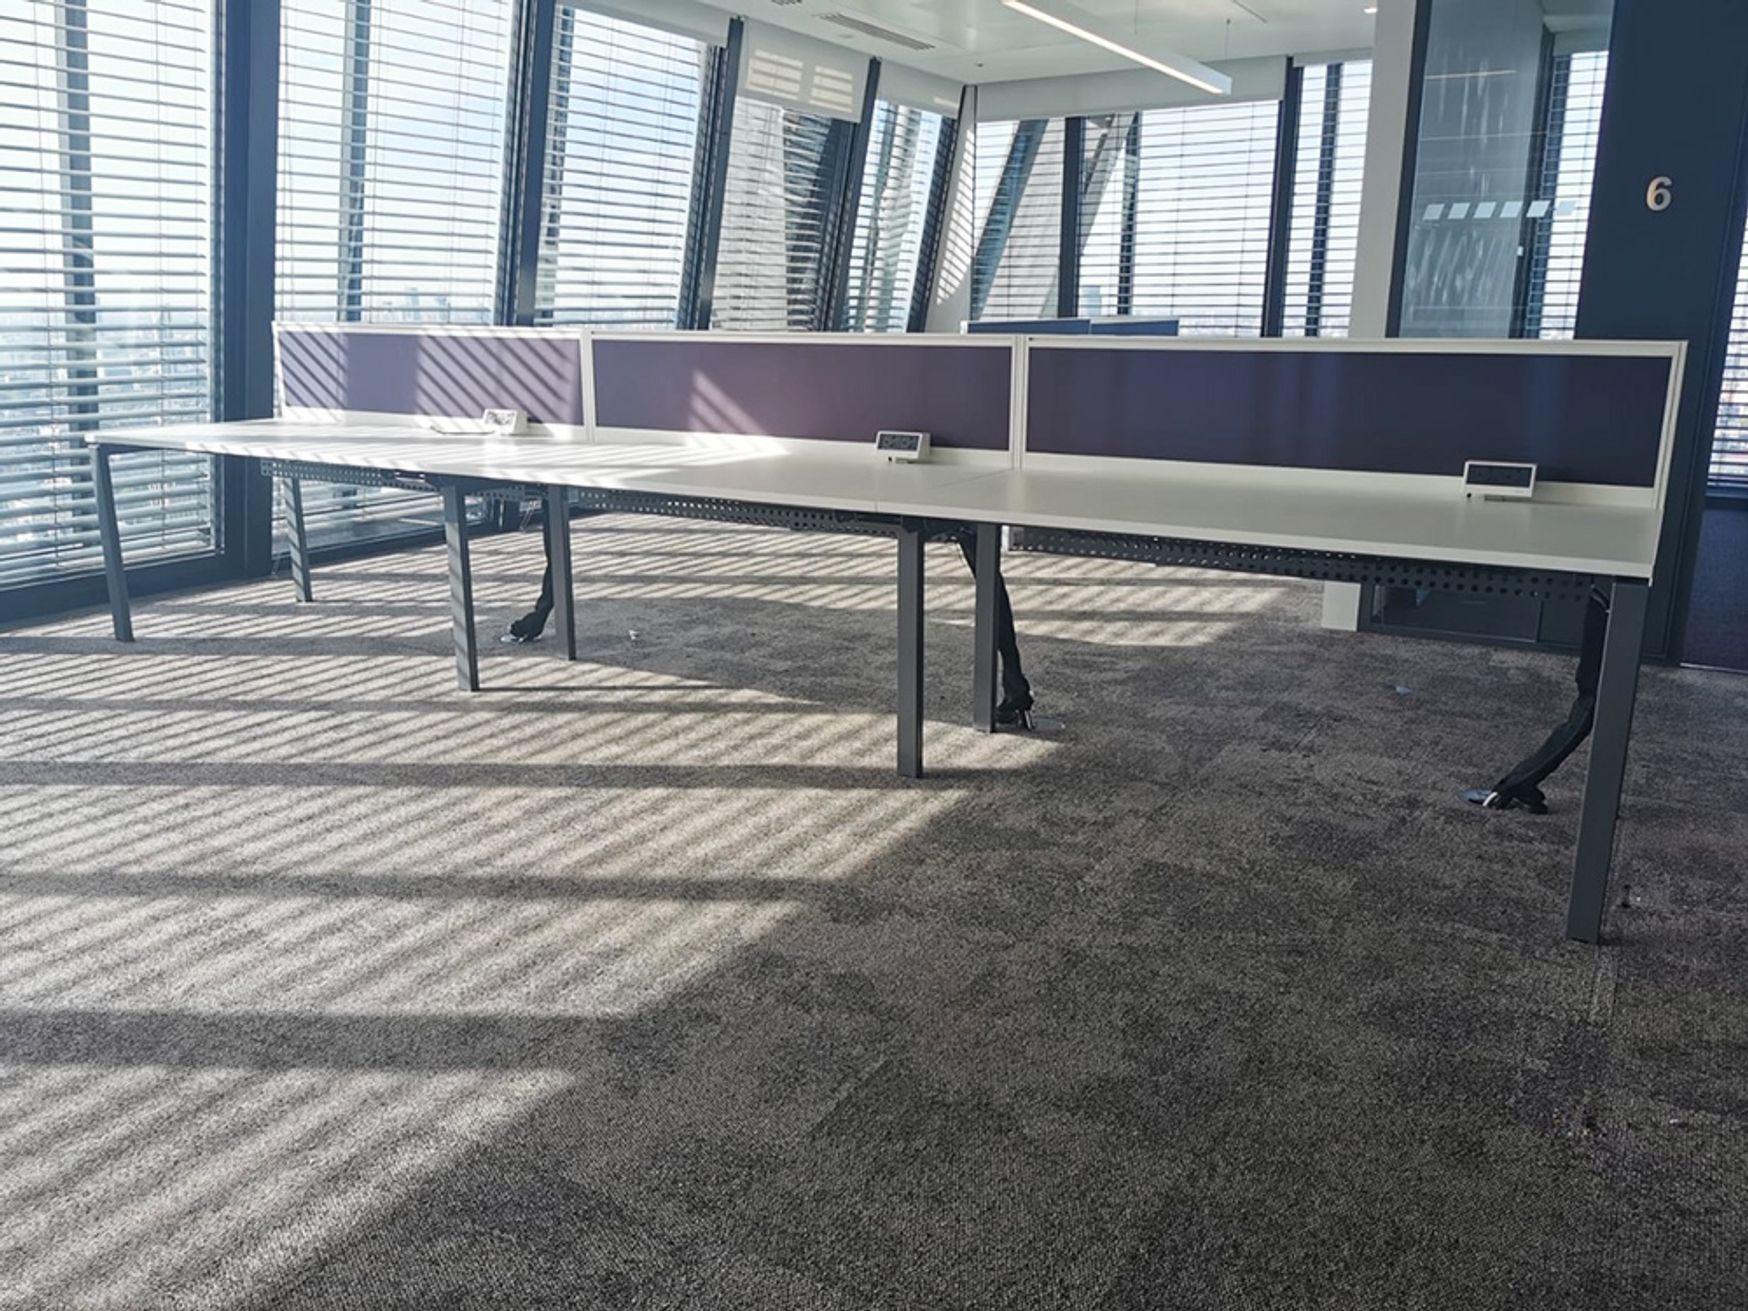 6 x 3-person side-by-side Task 'Team2' bench desks (18 x desk positions)